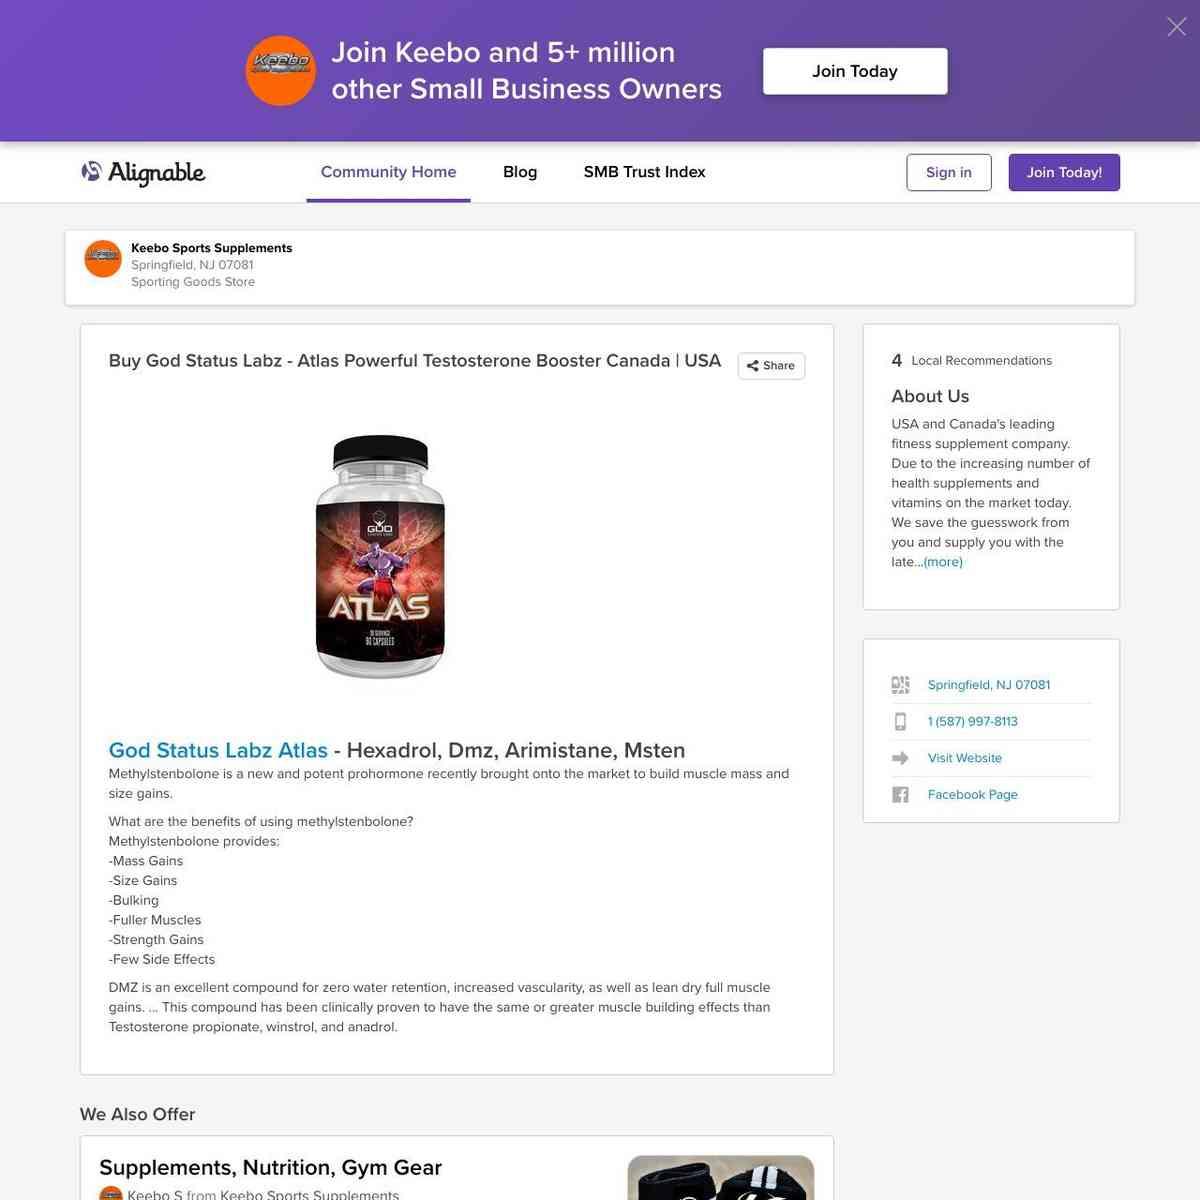 Buy God Status Labz - Atlas Powerful Testosterone Booster Canada | USA